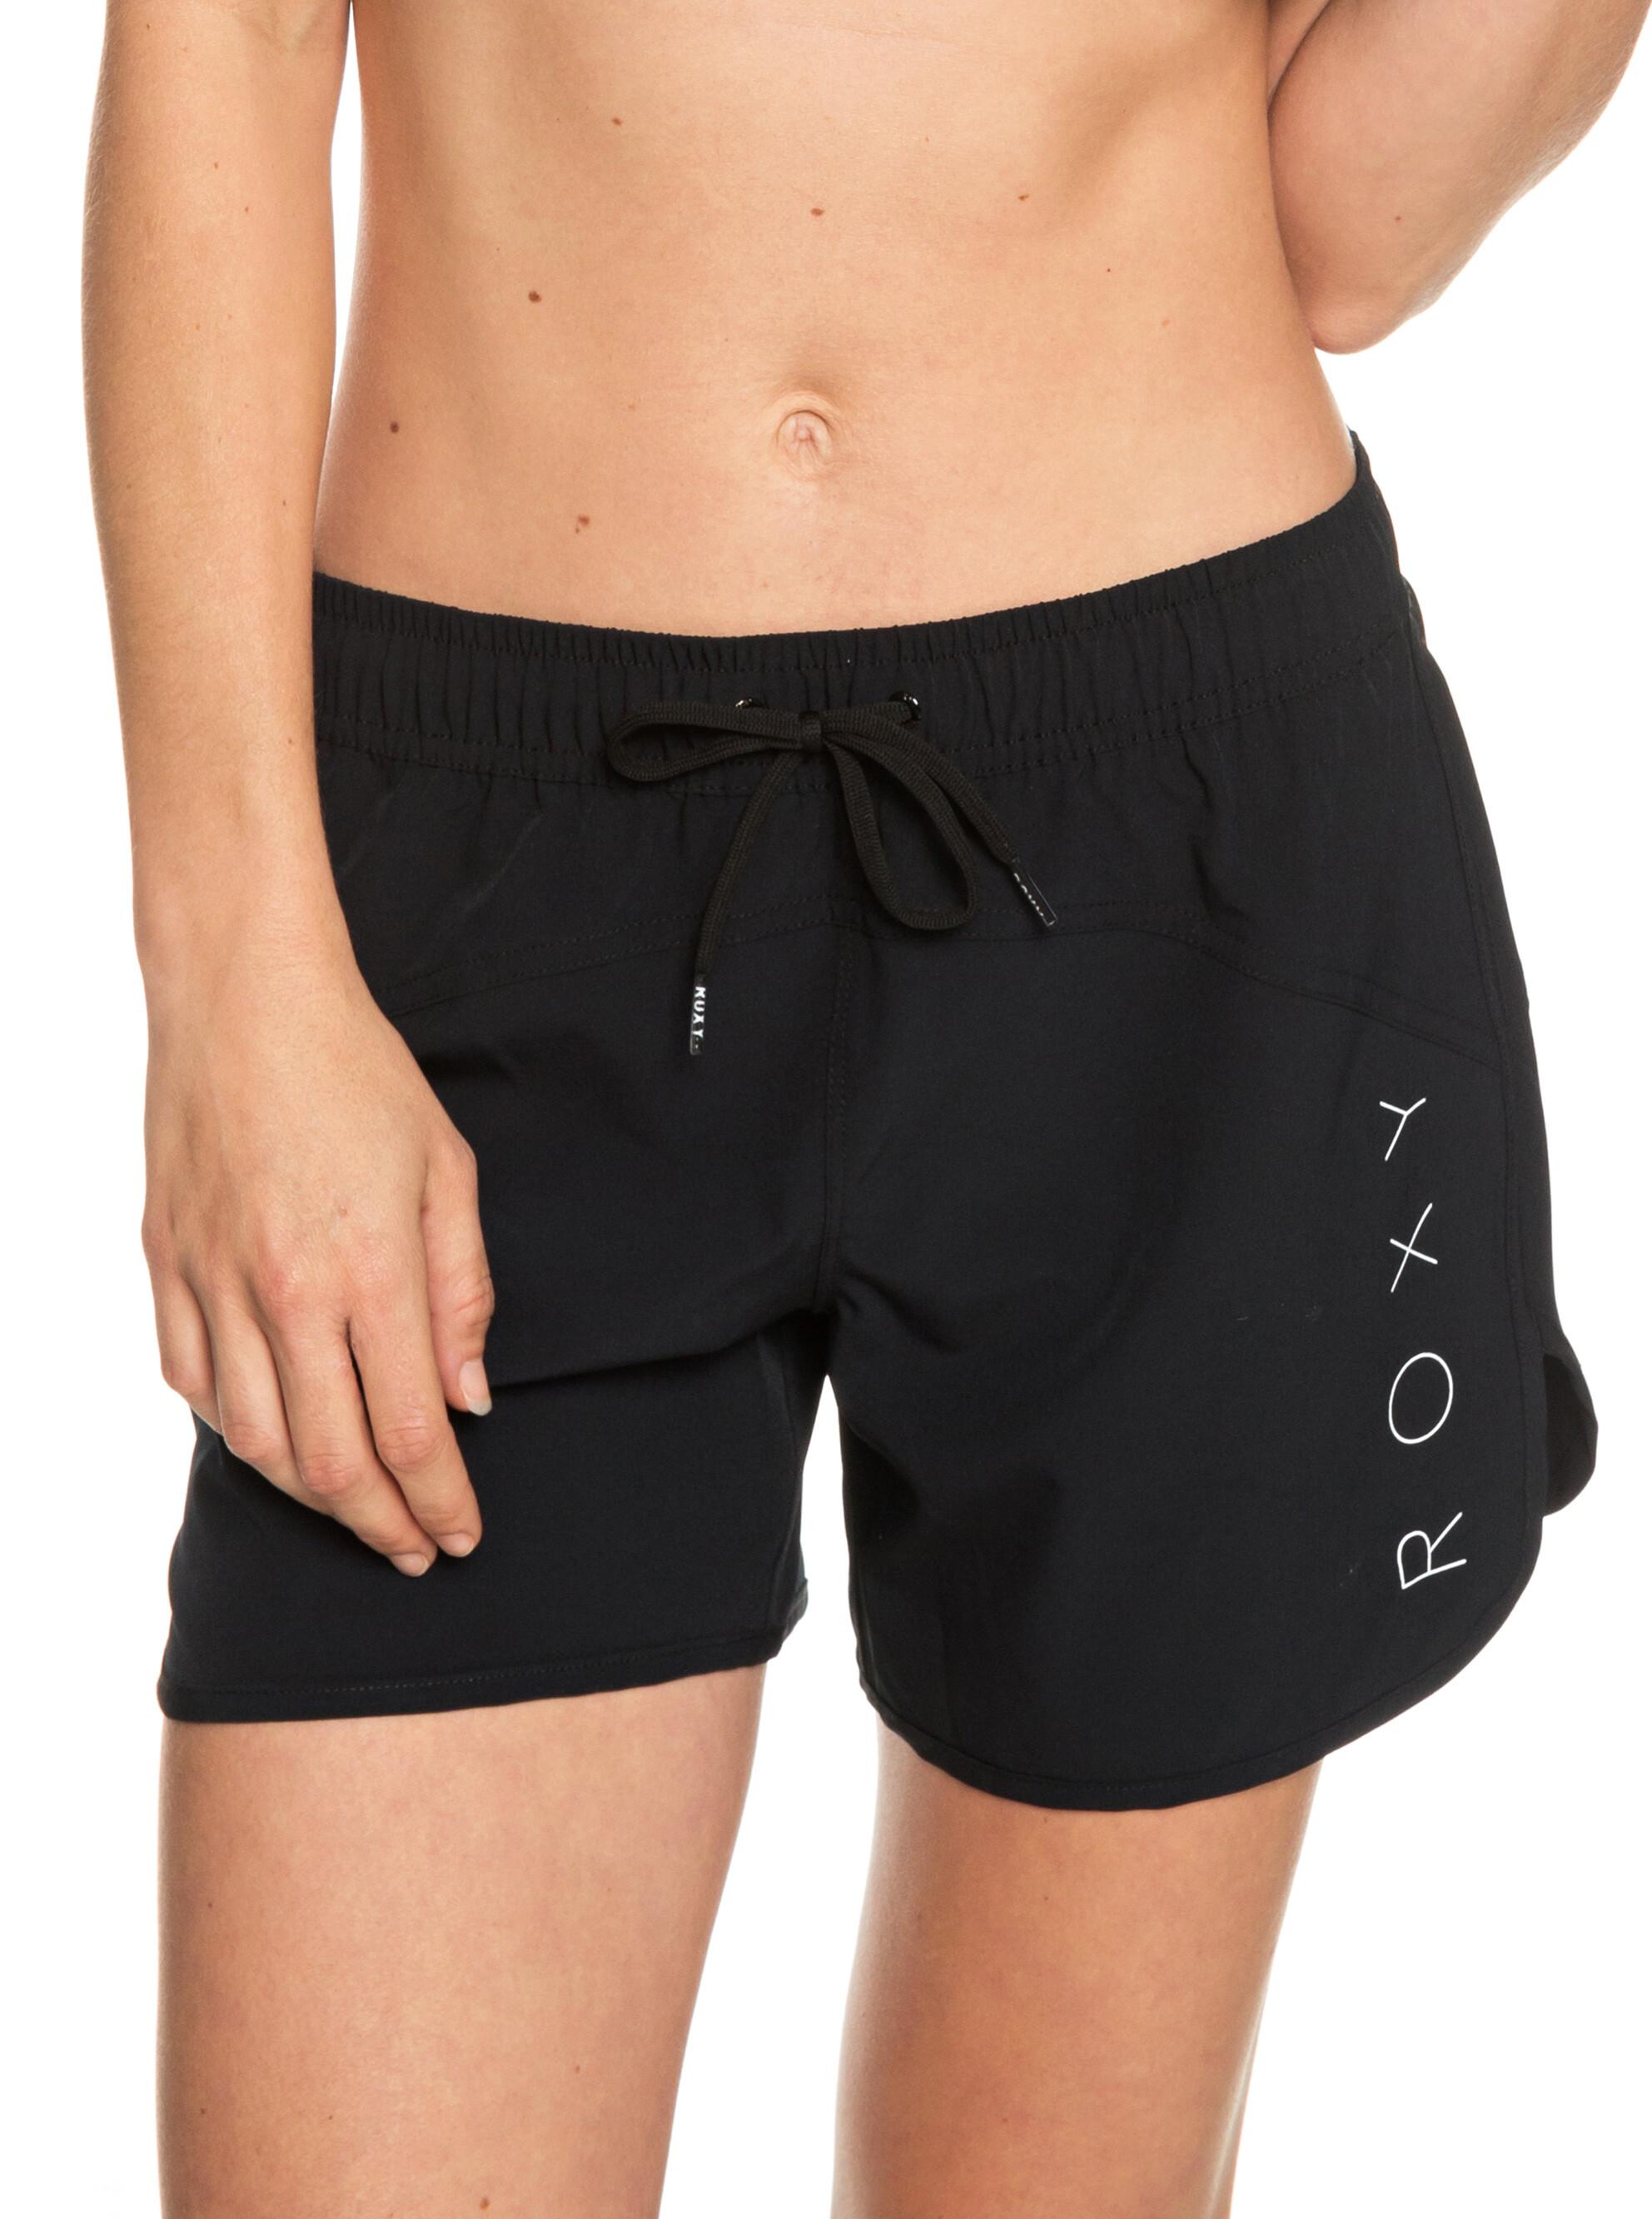 2b1e418d75a Roxy Chill Love 5 Badebukser Damer, true black | Find outdoortøj ...